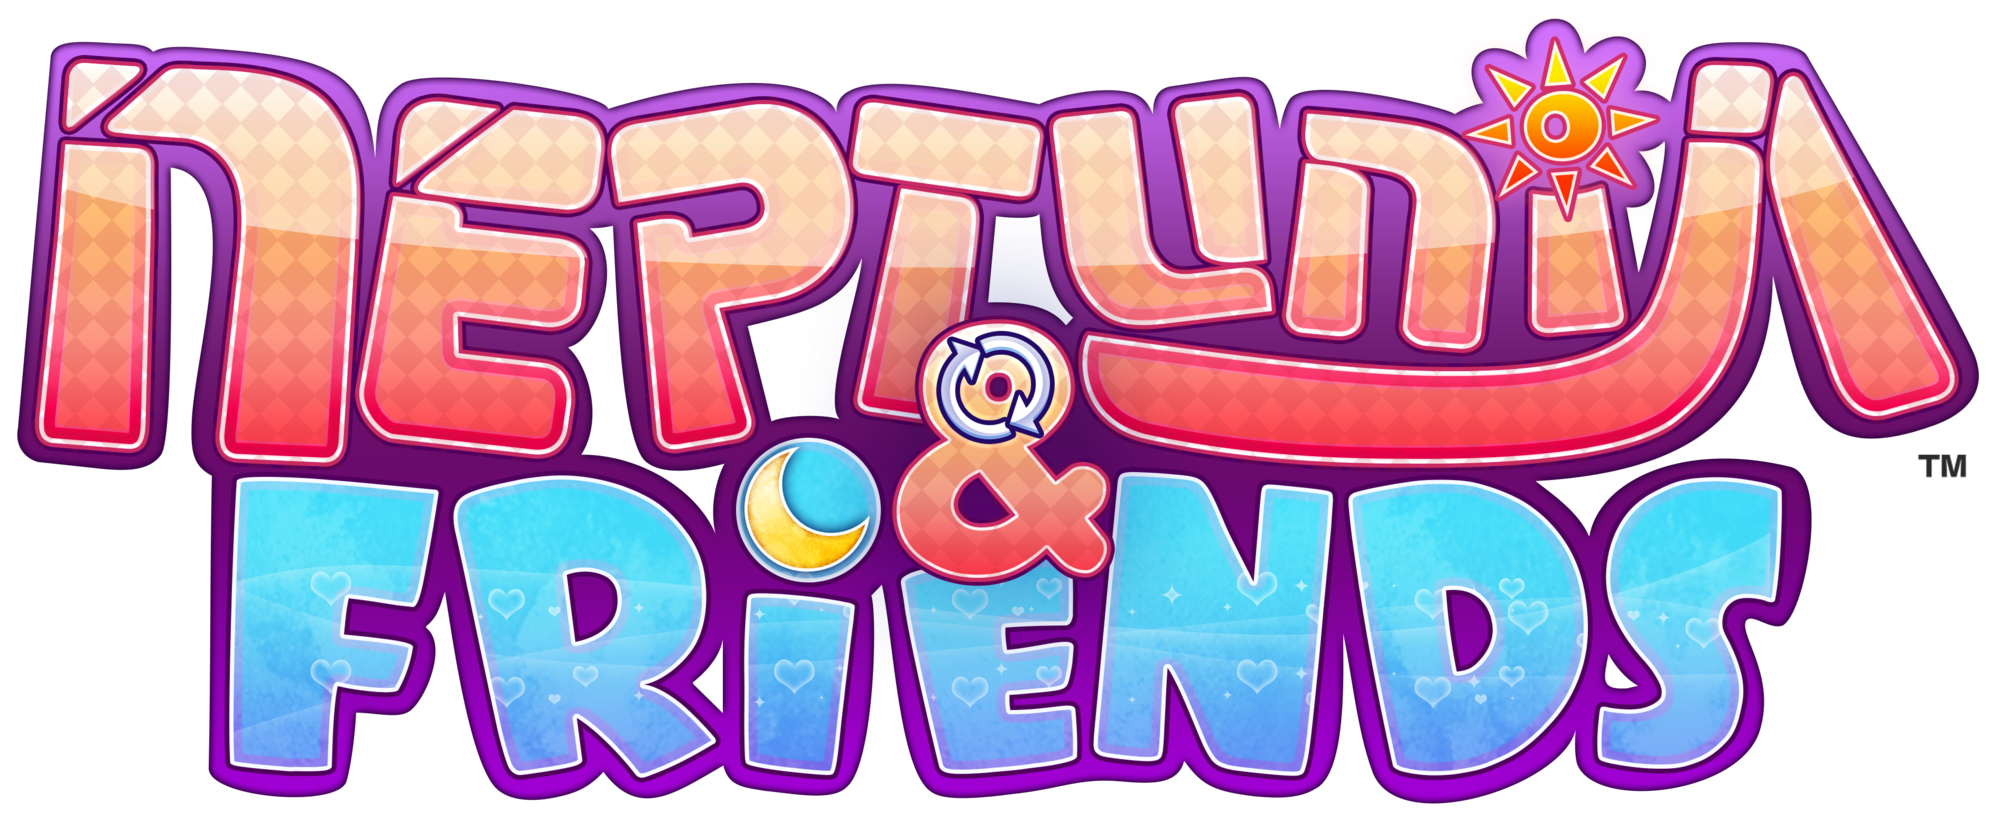 Neptunia & Friends | Hyperdimension Neptunia Wiki | FANDOM powered